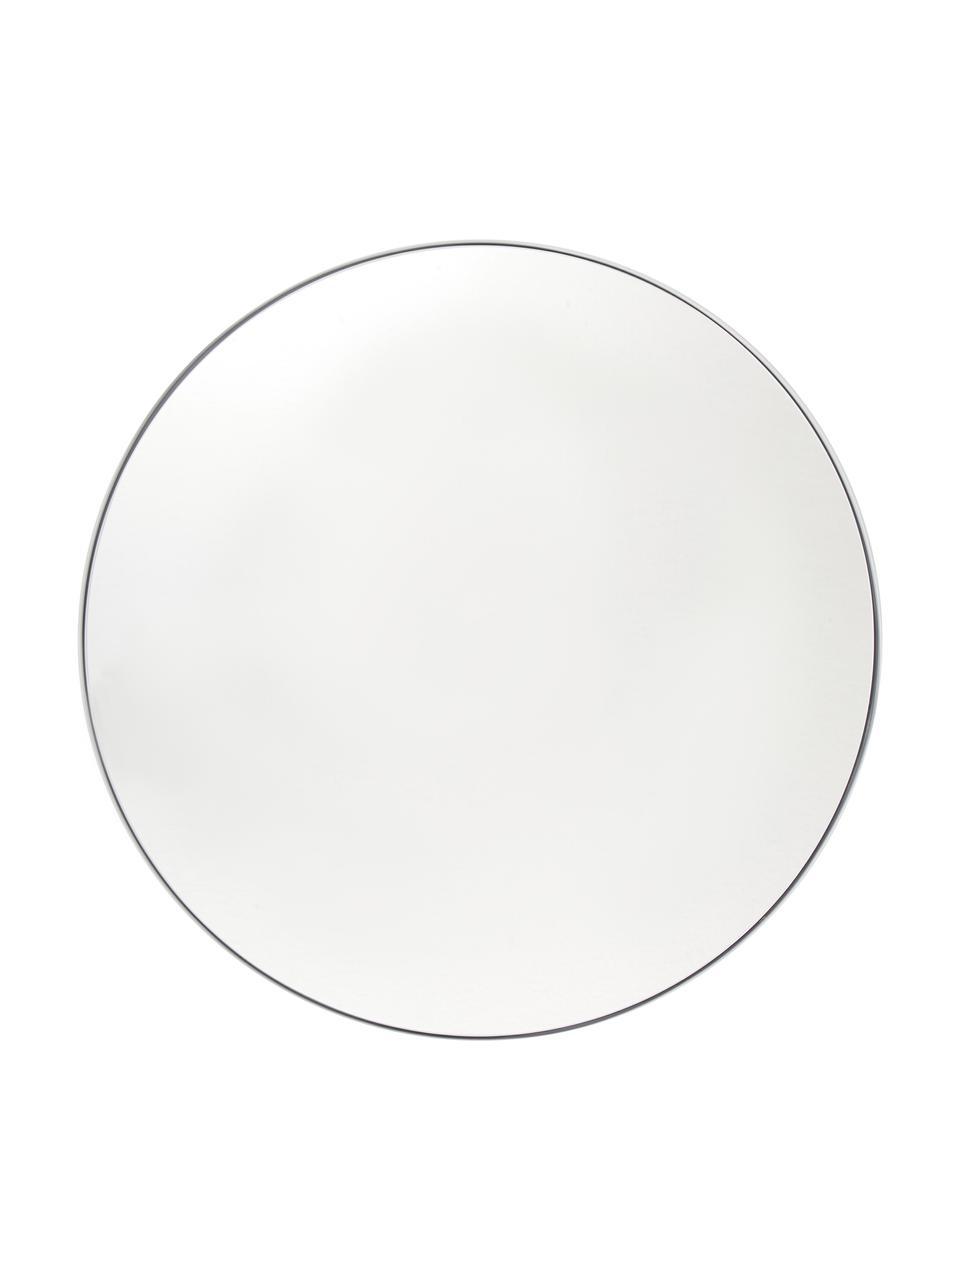 Kulaté nástěnné zrcadlo Ivy, Bílá